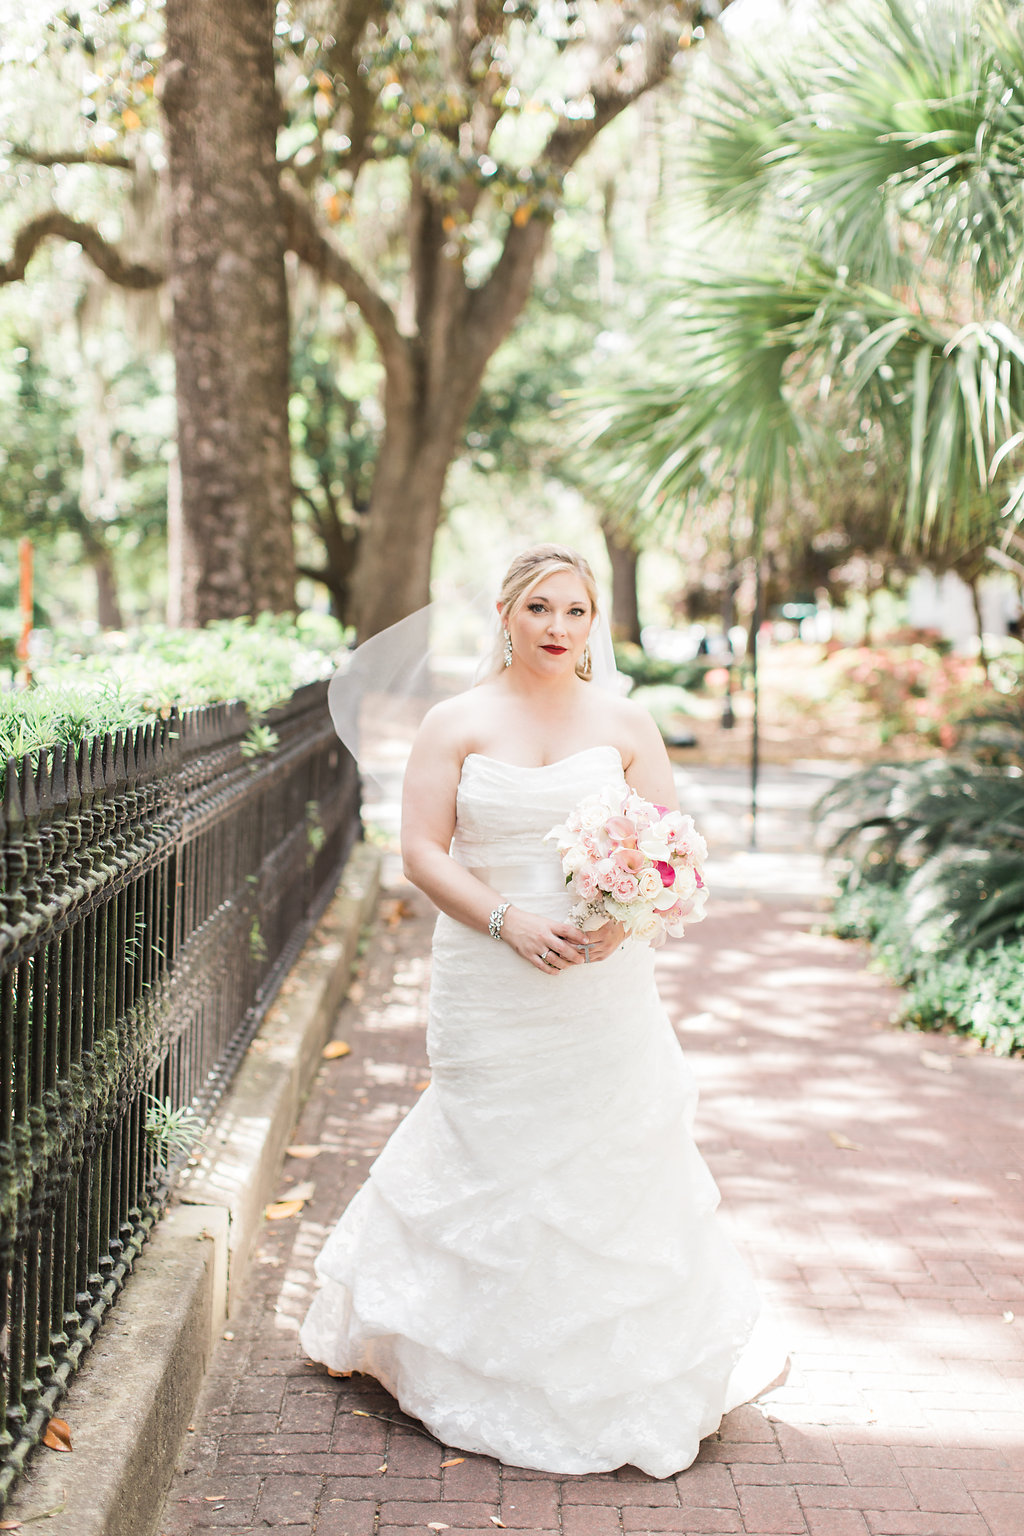 kristin-and-darren-wedding-soho-south-cafe-wormsloe-apt-b-photography-savannah-wedding-planner-savannah-weddings-southern-weddings-best-savannah-wedding-planner-6.JPG